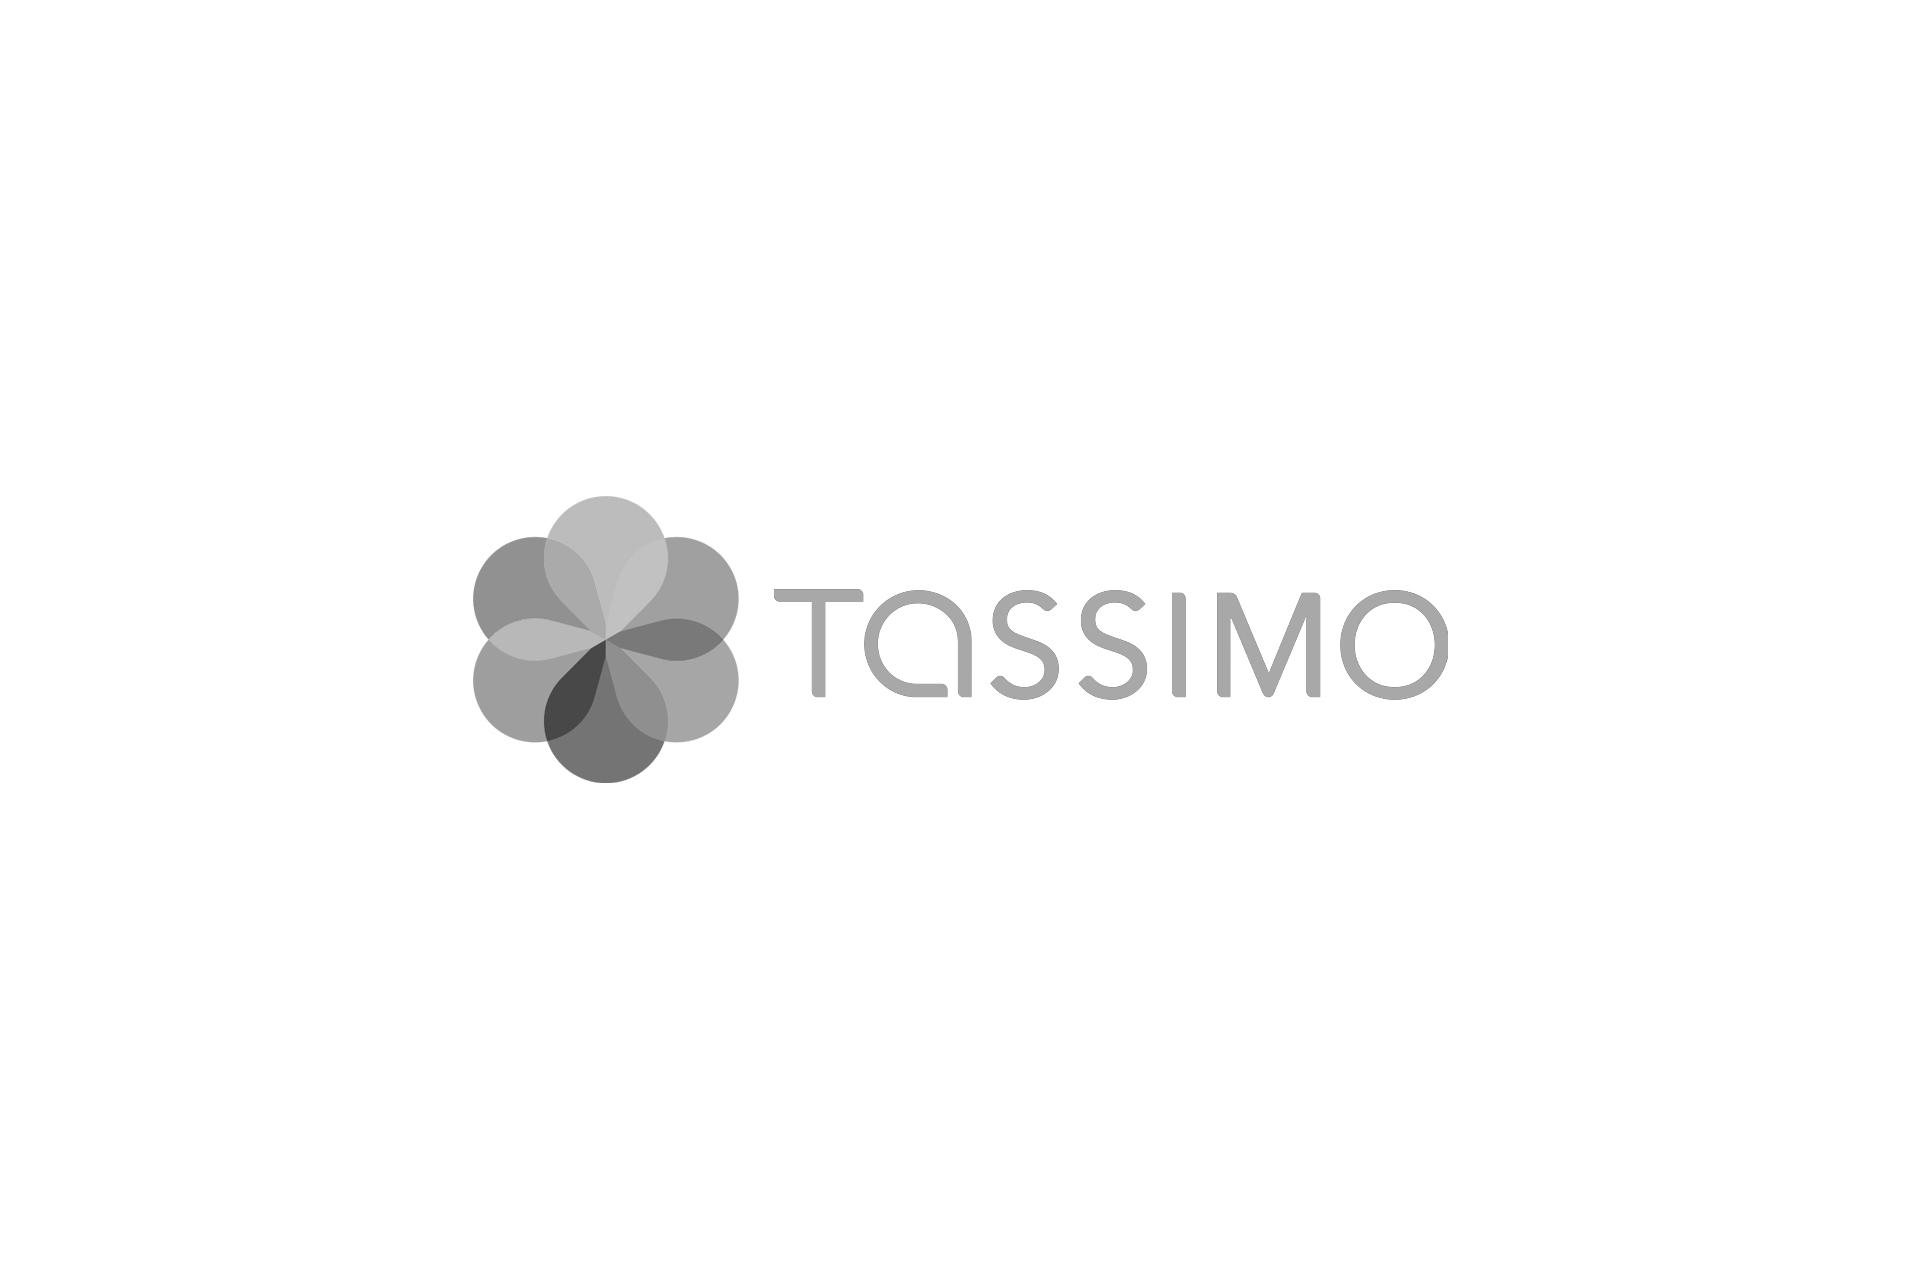 tassimo logo grey